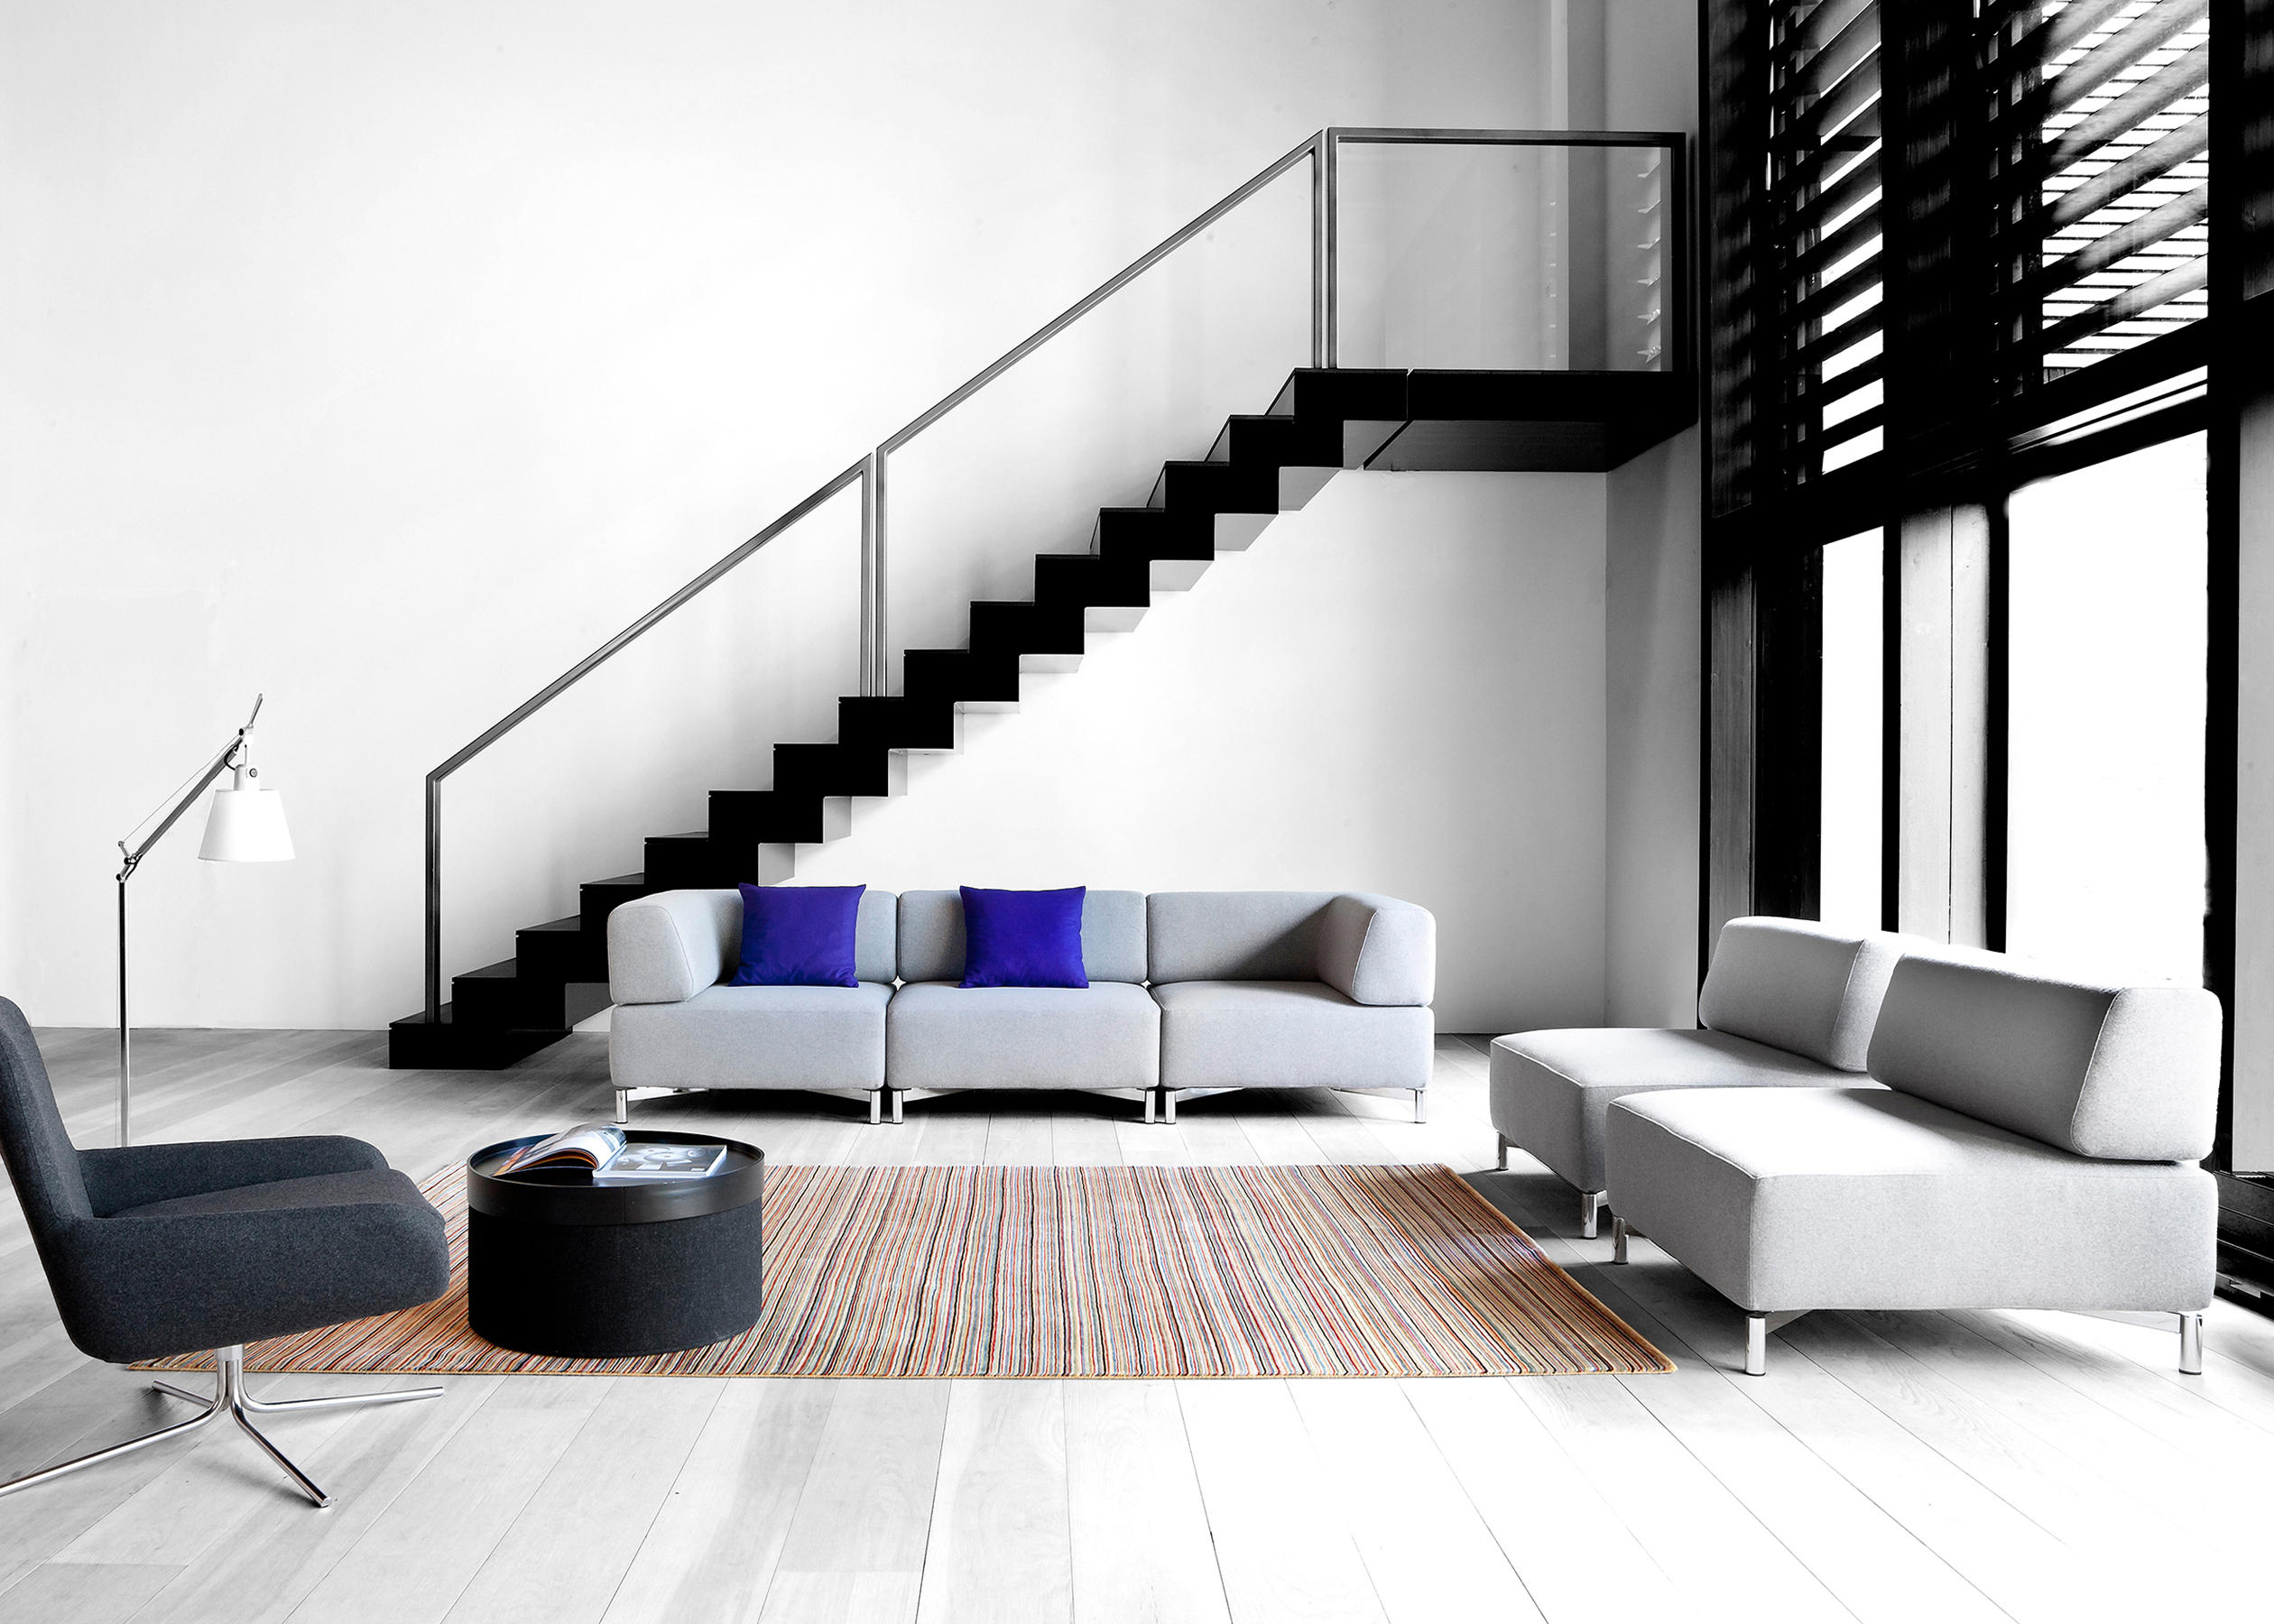 Beau ... Planet Sofa By Softline A/S ...